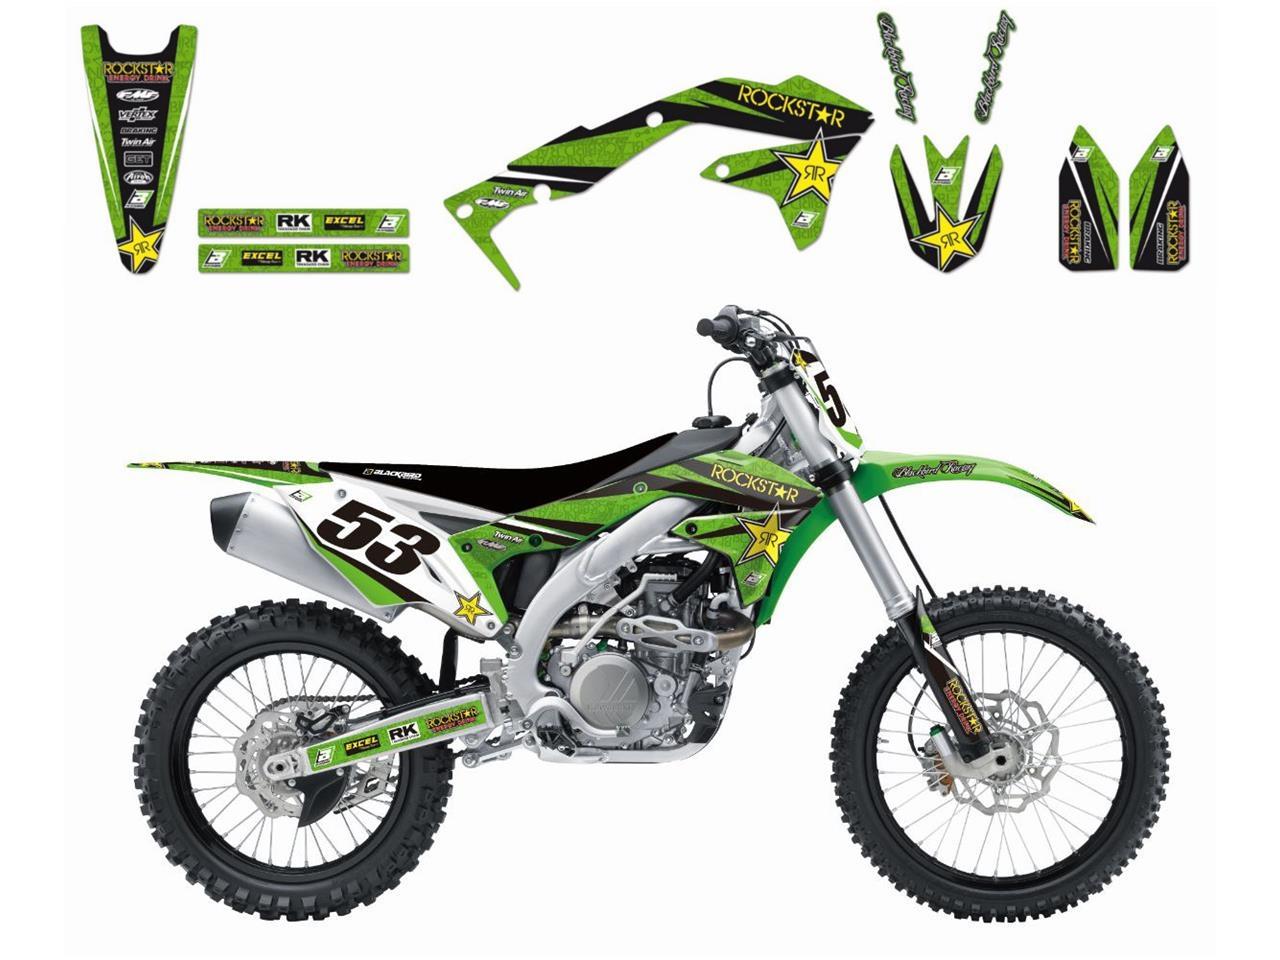 Kit déco Blackbird Rockstar Energy Kawasaki 250 KX-F 09-12 vert